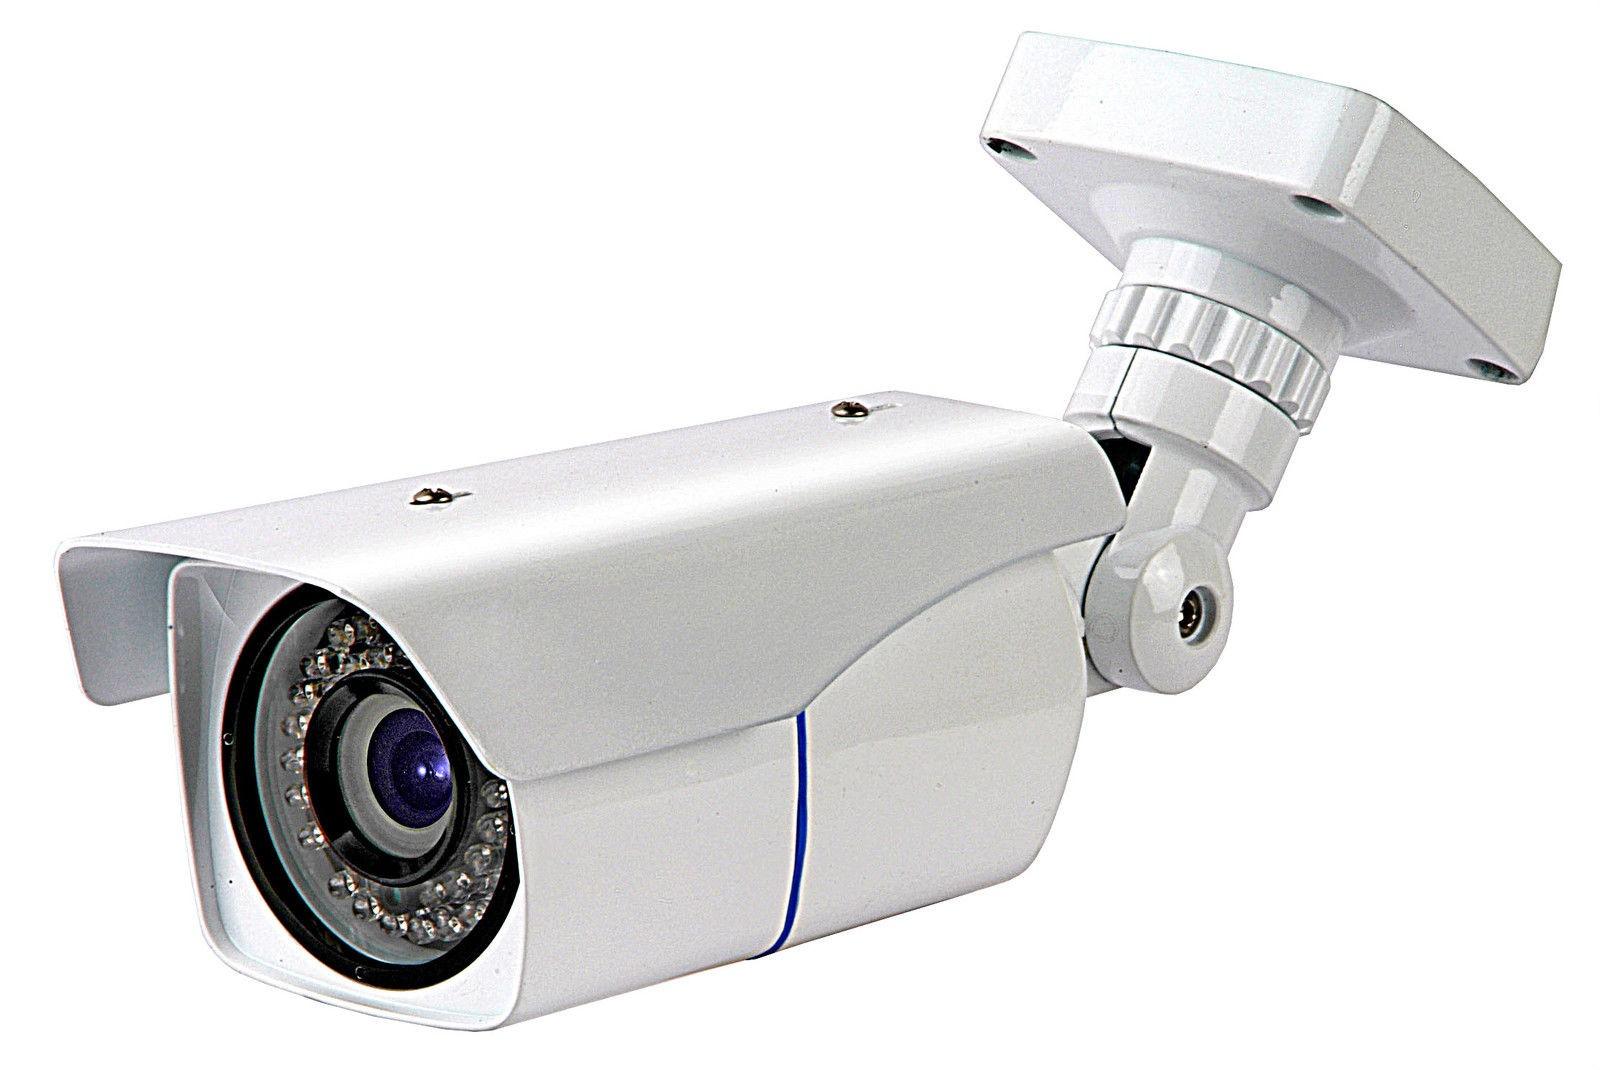 Ertech Sony IMX 2MP 1080P 2.8-12MM 40M IR Turbo HD-TVI Outdoor Bullet Security Camera